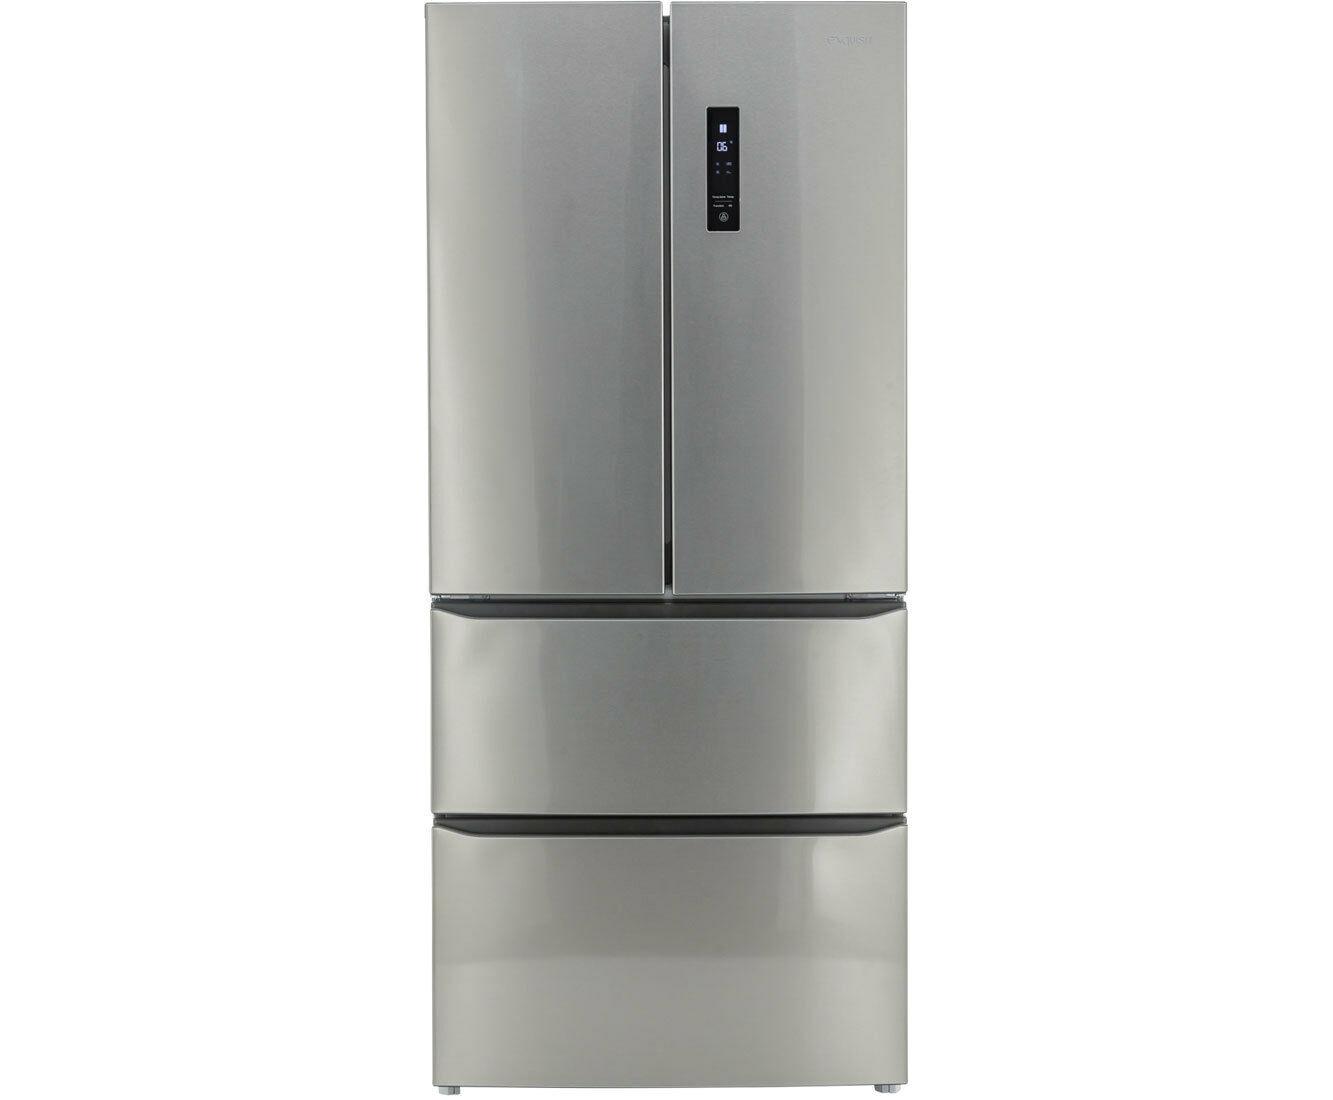 Bomann Kühlschrank 55 Cm : Masse kuehlschrank freistehend siemens kühlschrank freistehend